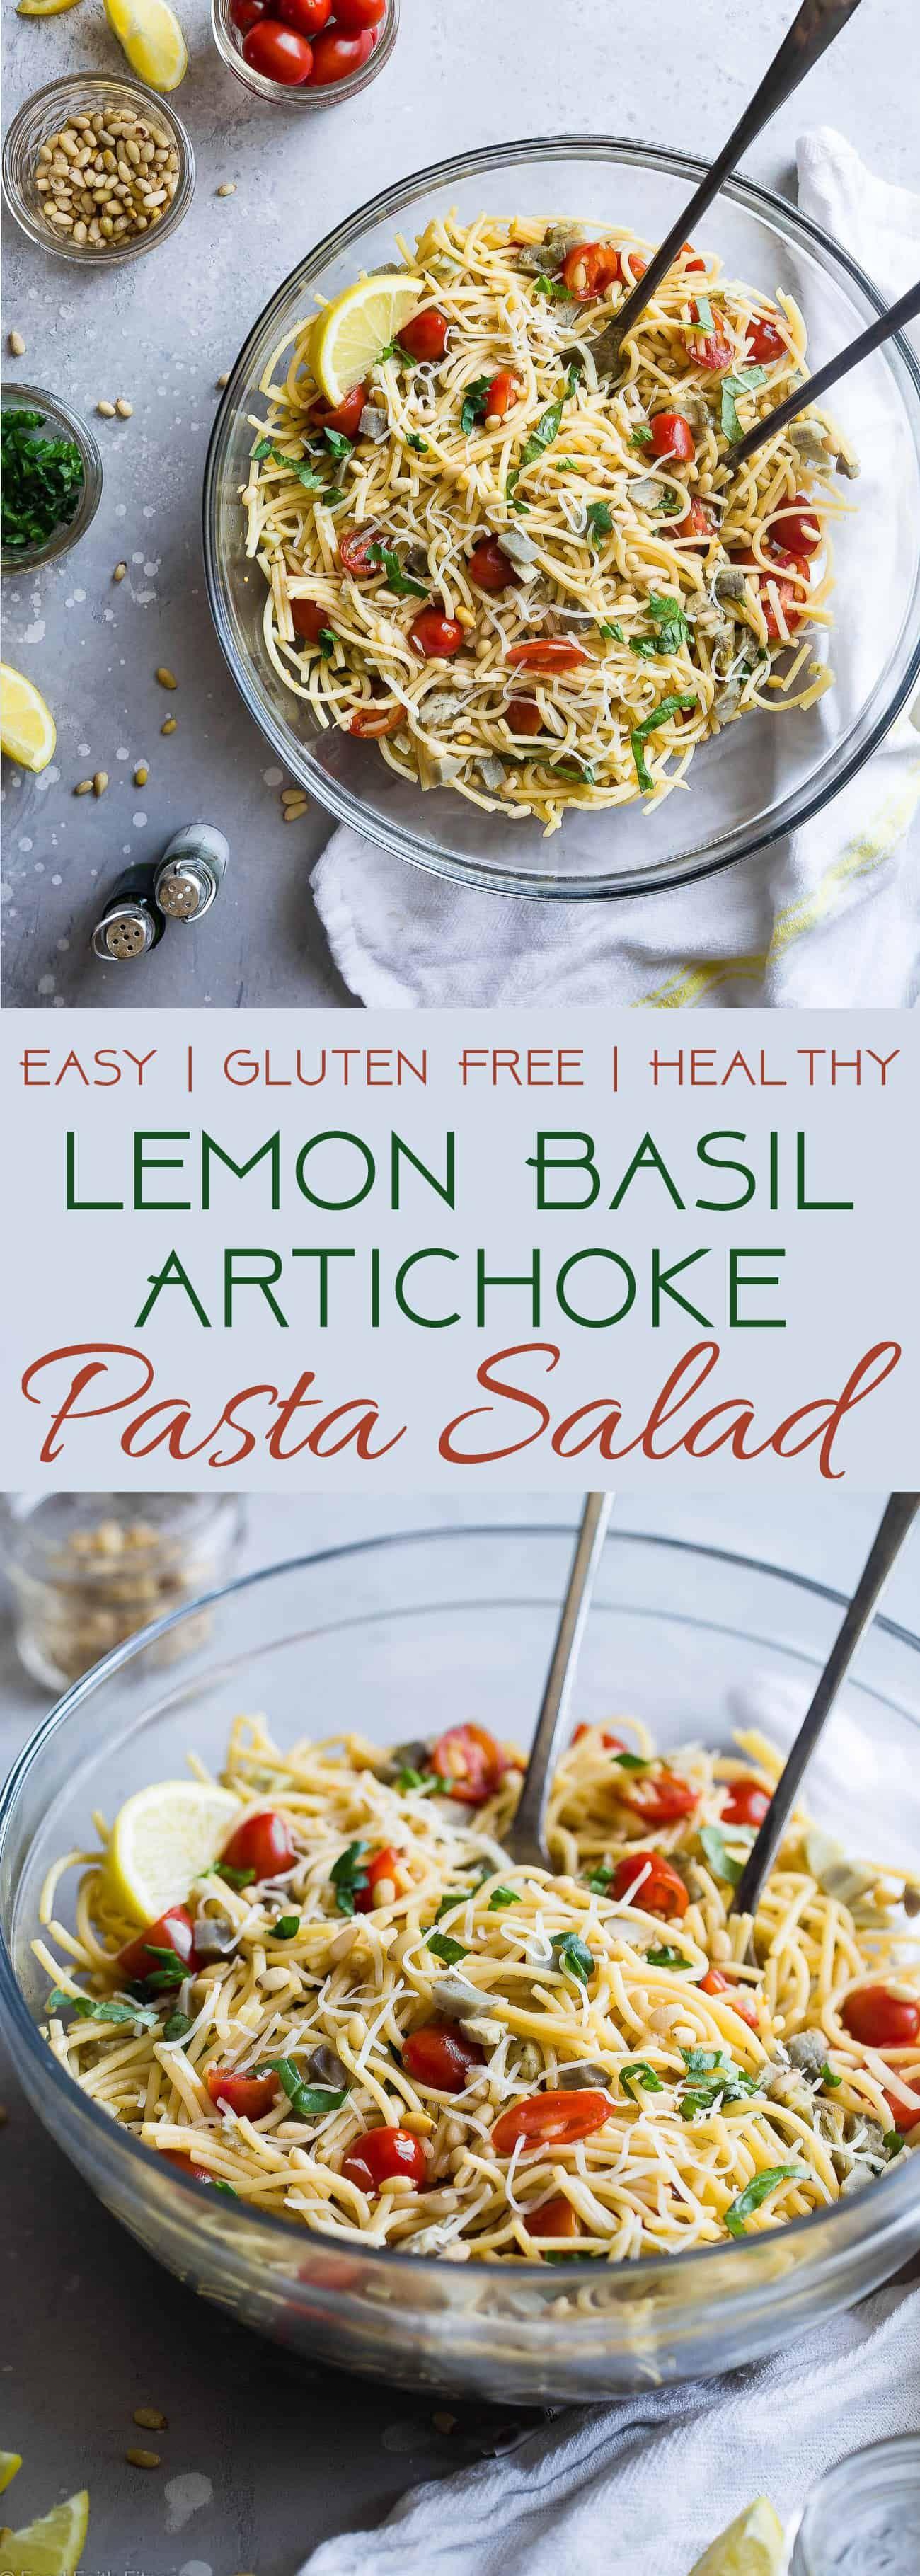 Gluten Free Lemon Artichoke Spaghetti Pasta Salad-A simple, healthy, vegan friendly pasta salad with creamy, roasted artichokes, bright fresh basil, garlic and lemon vinaigrette! Big flavors, so easy and great for Spring or Potlucks!    